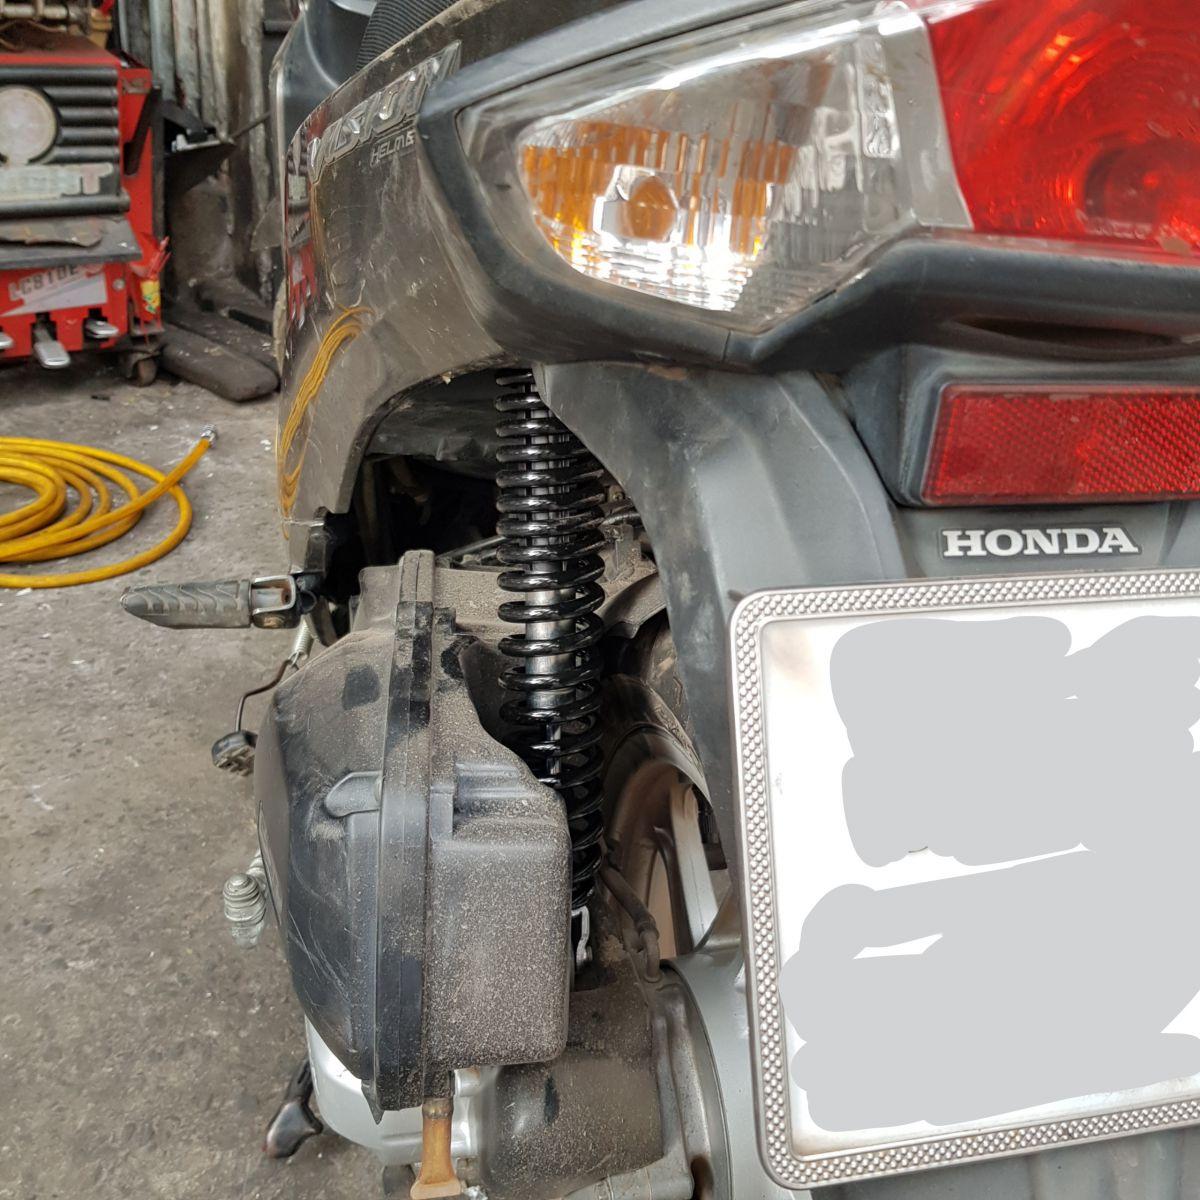 Phuoc-sau-Vision-chinh-hang-Honda-17